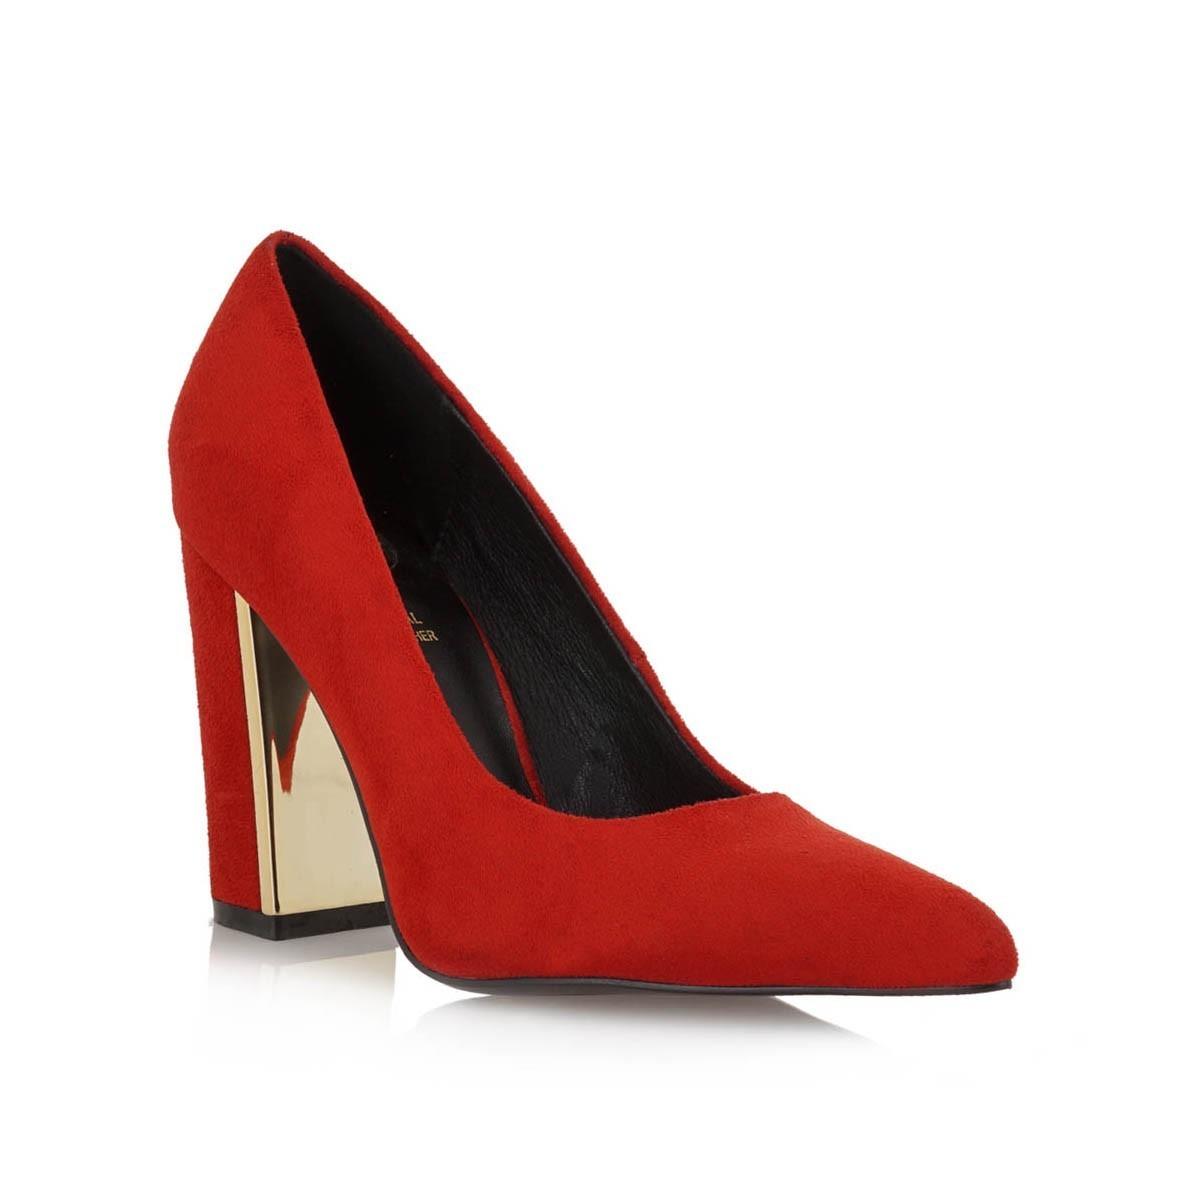 Exe Shoes Γυναικείες Γόβες 966-PATRICIA-900 Κόκκινο Καστόρι H17009665704